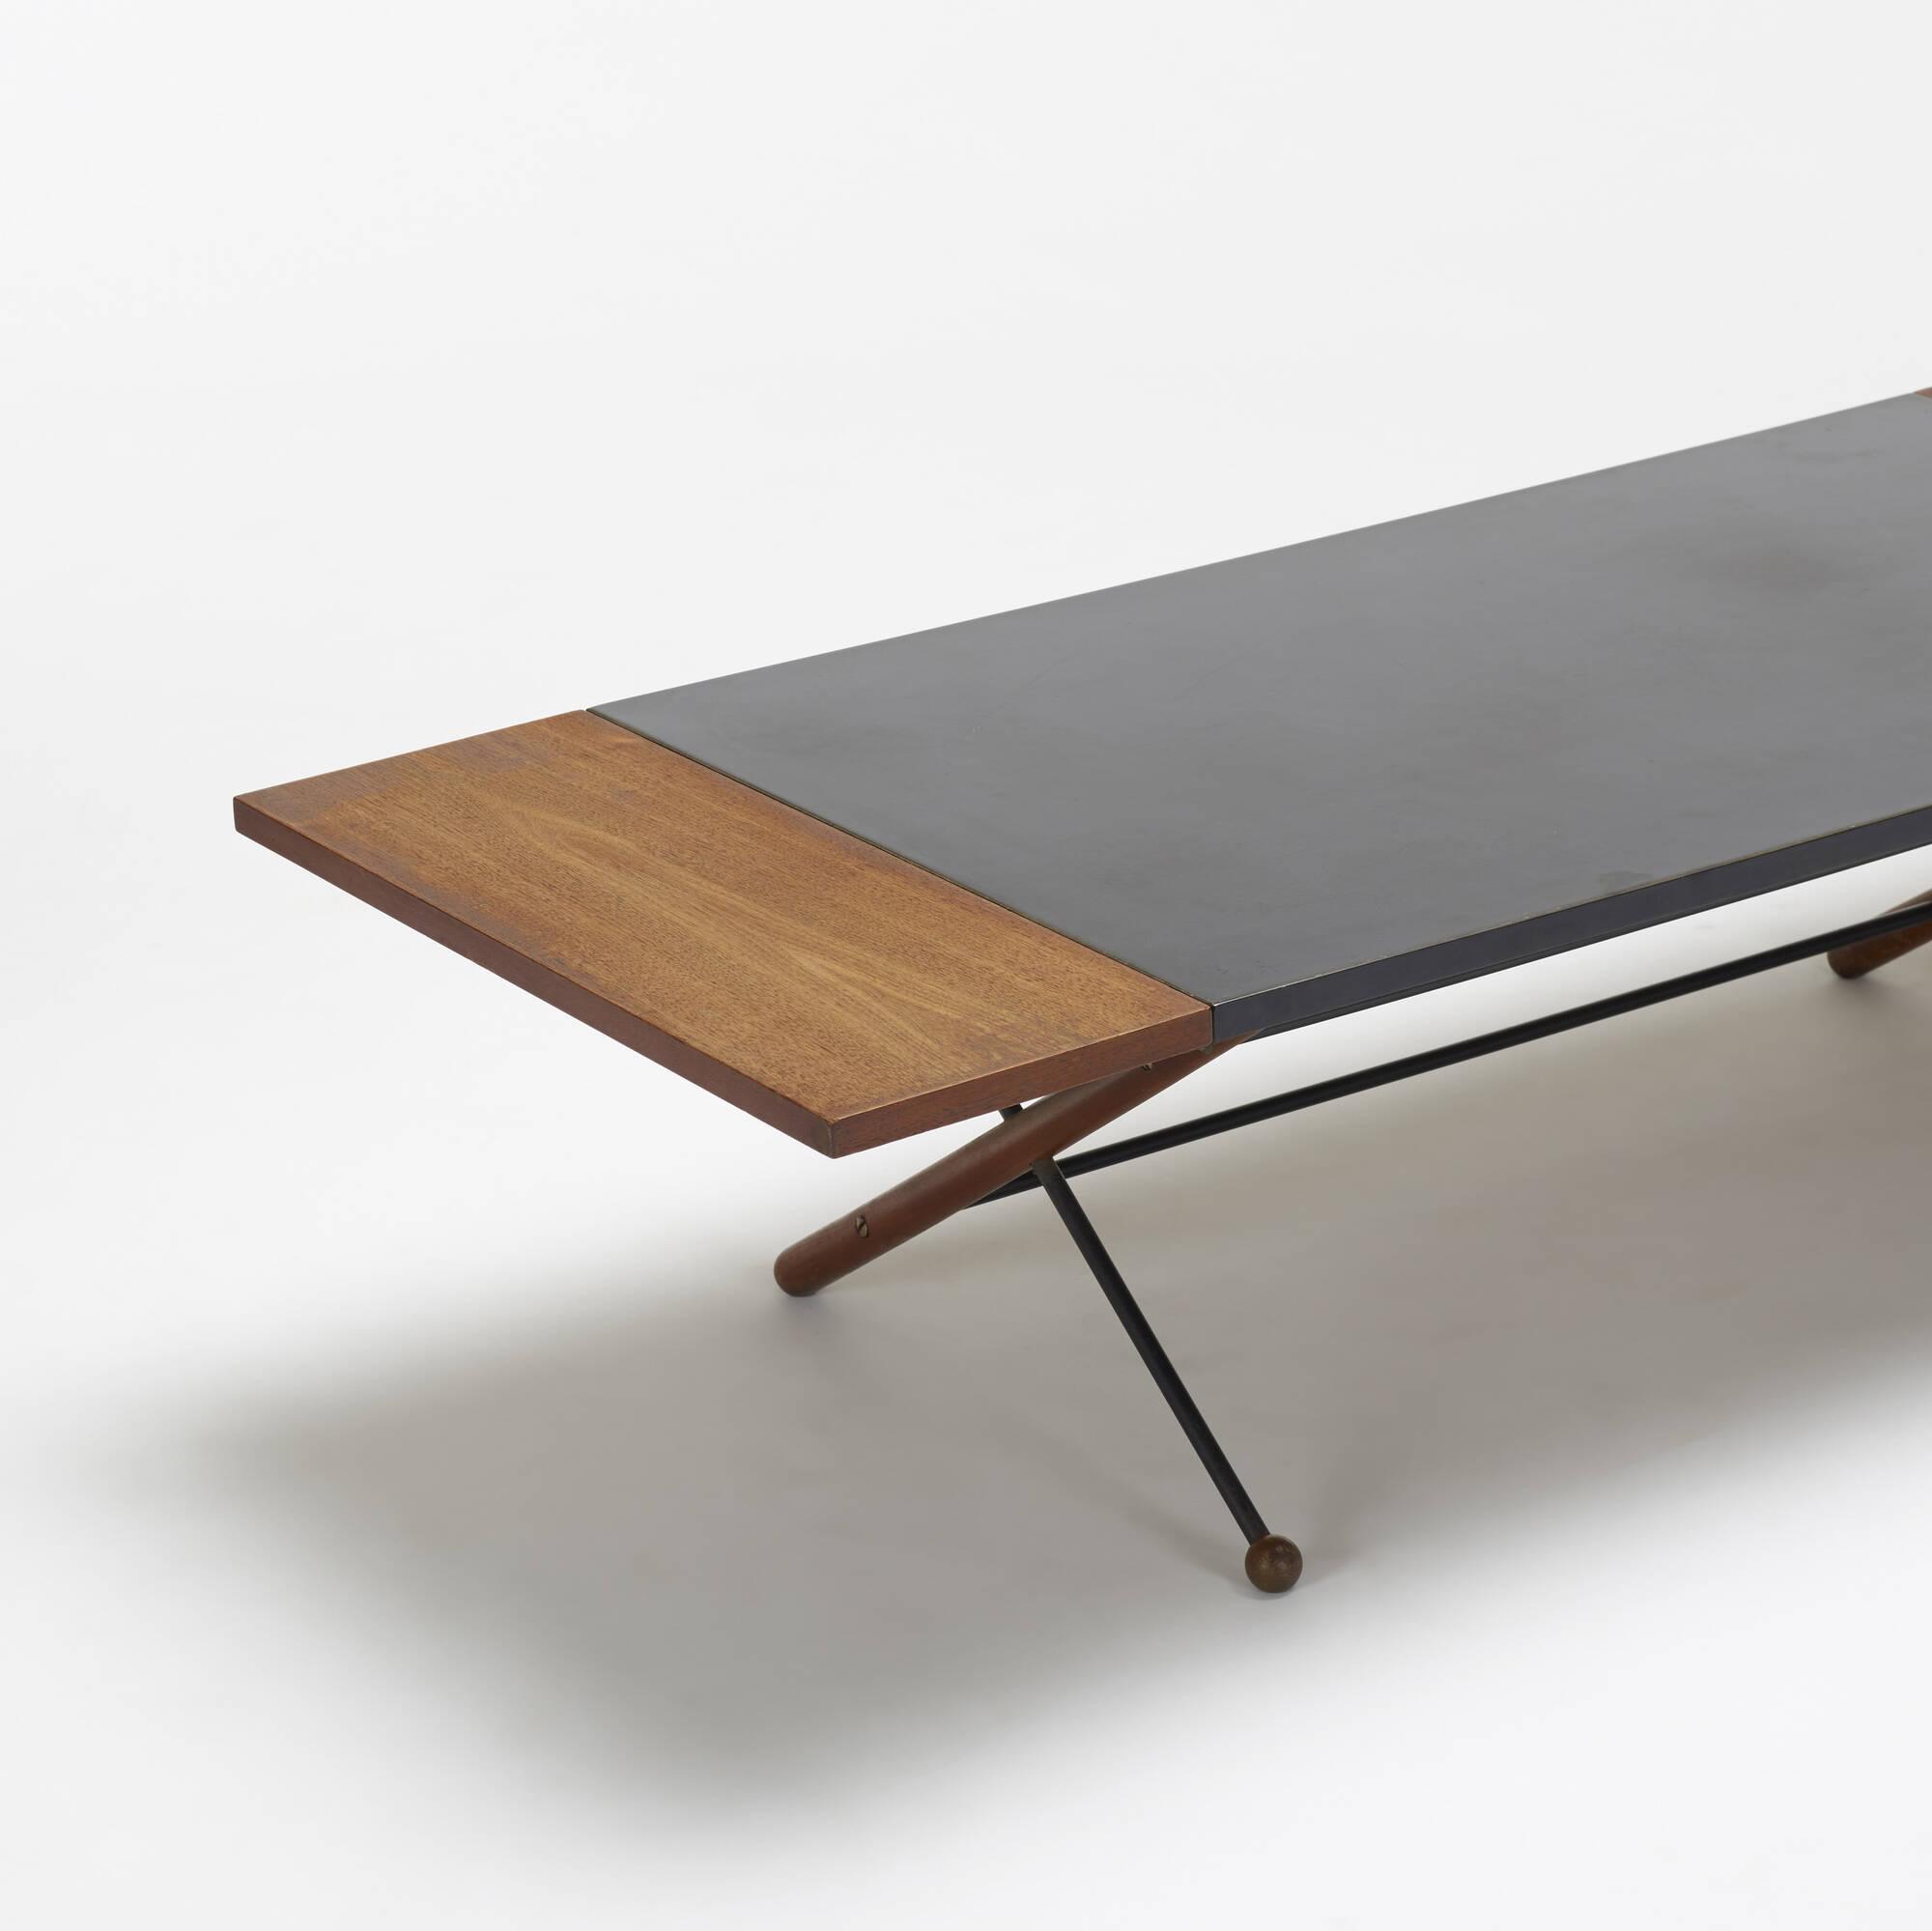 156 greta magnusson grossman coffee table design 26 october 156 greta magnusson grossman coffee table 3 of 5 geotapseo Gallery